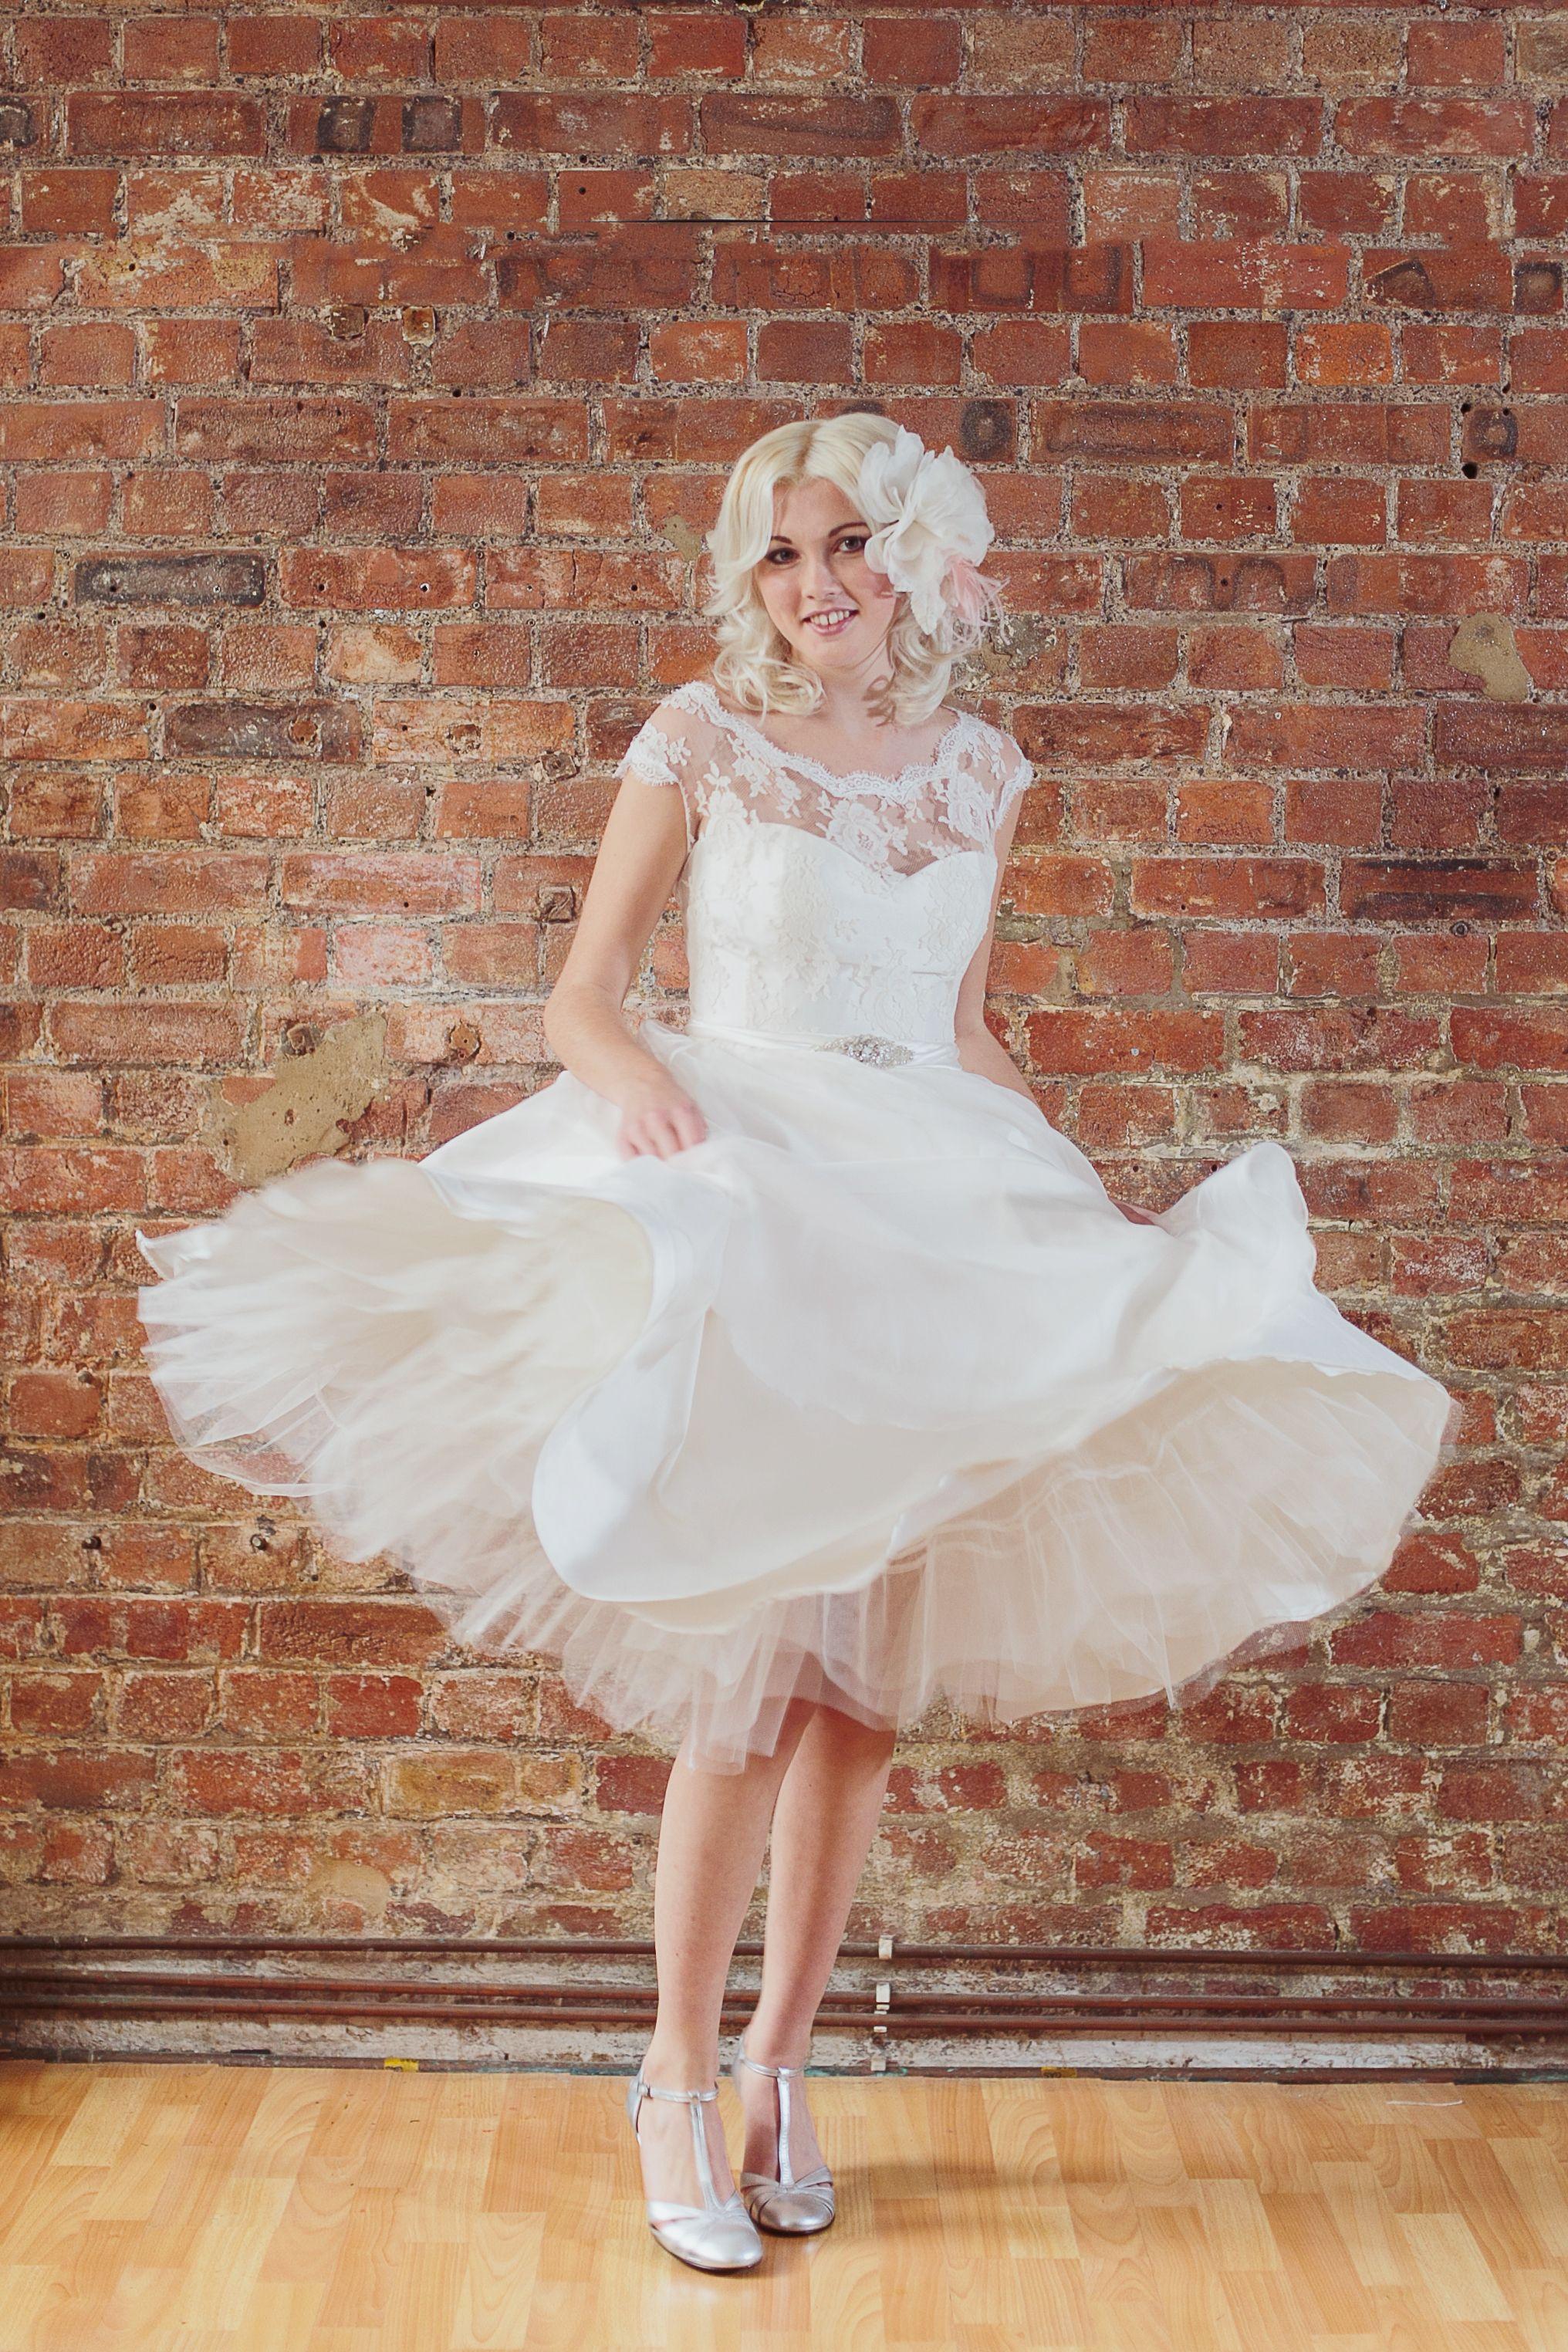 1950s style wedding dresses  Fifties style wedding dress designed by Dana Bolton